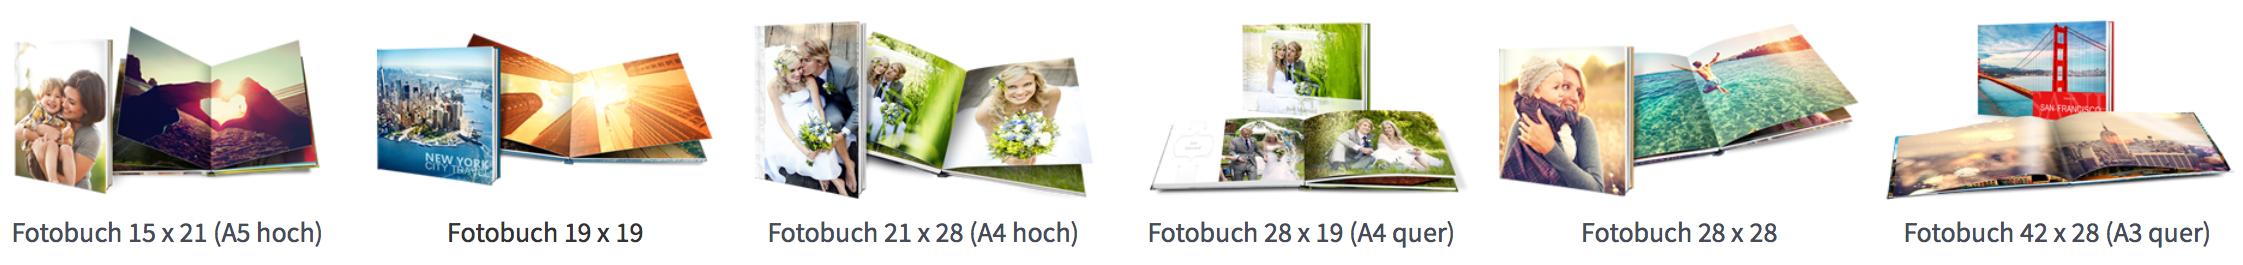 Saal Digital Fotobuch Formate